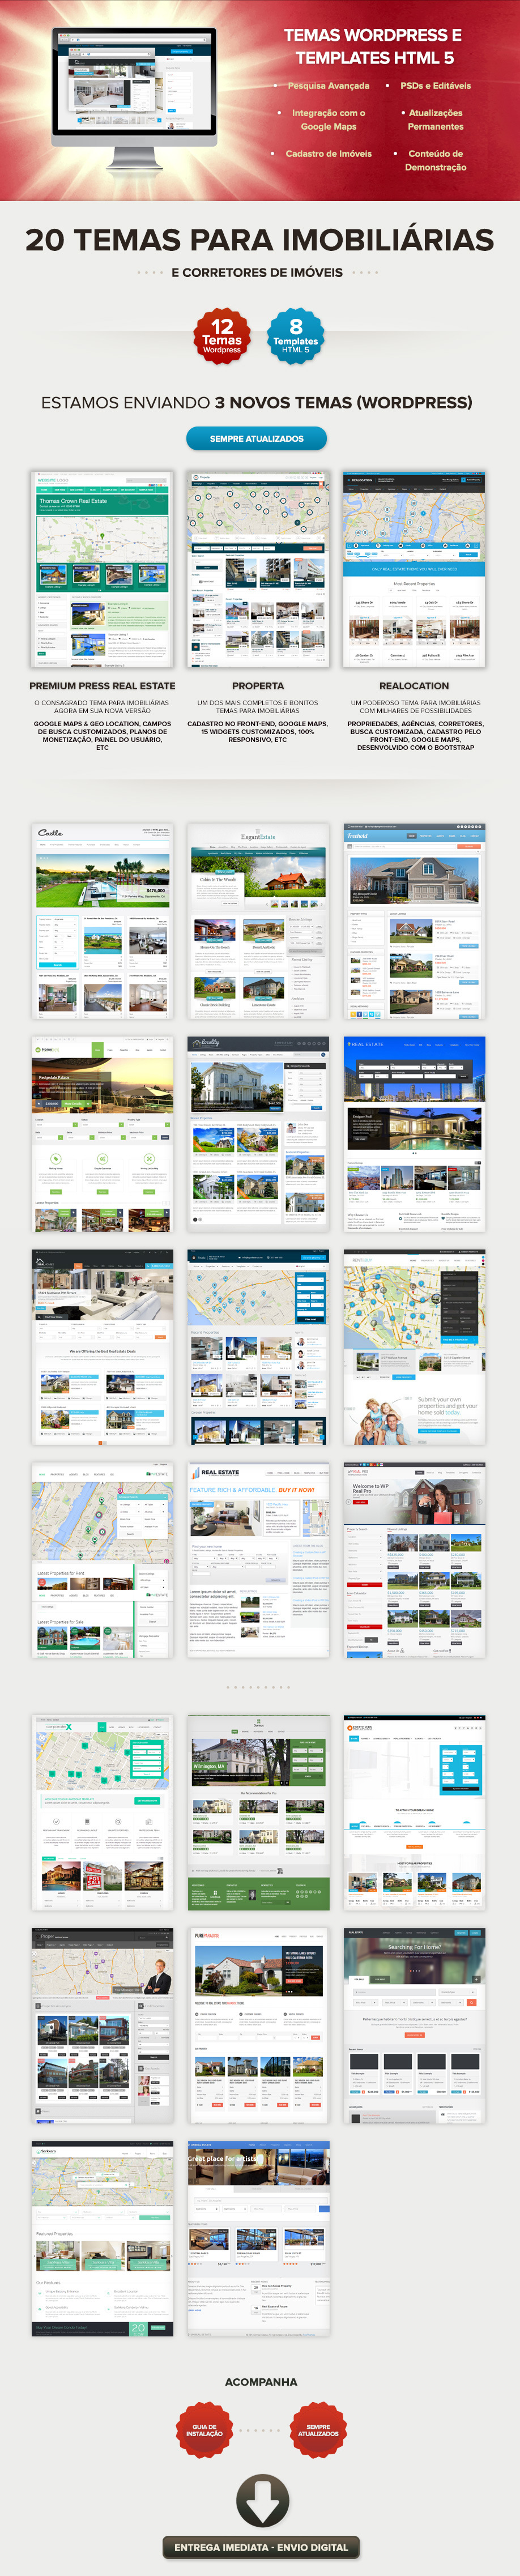 layout32.jpg